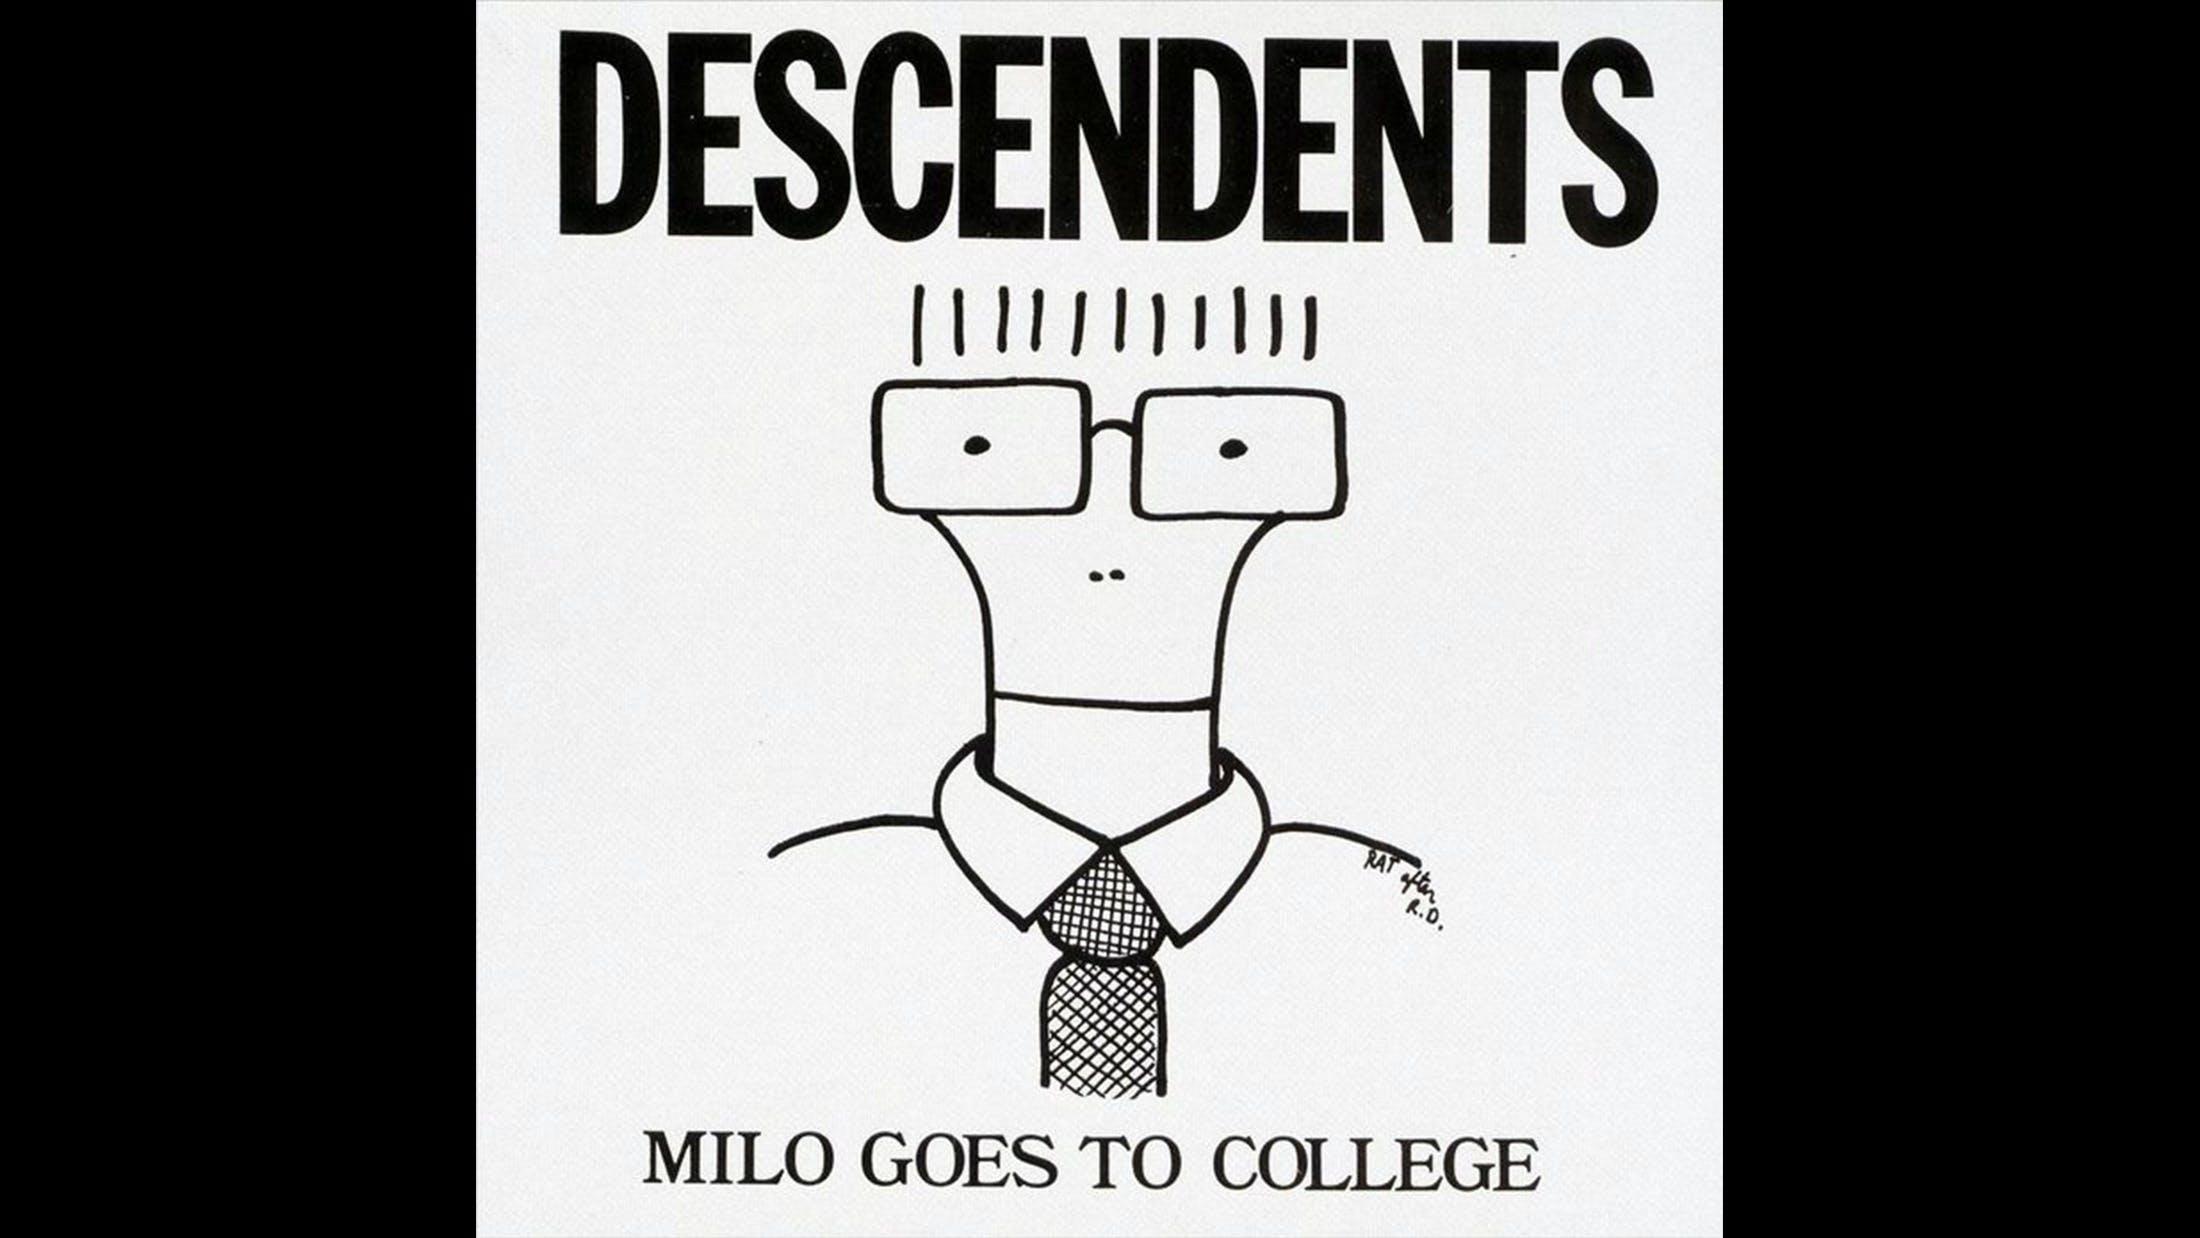 4. Descendents - Milo Goes To College (1982)